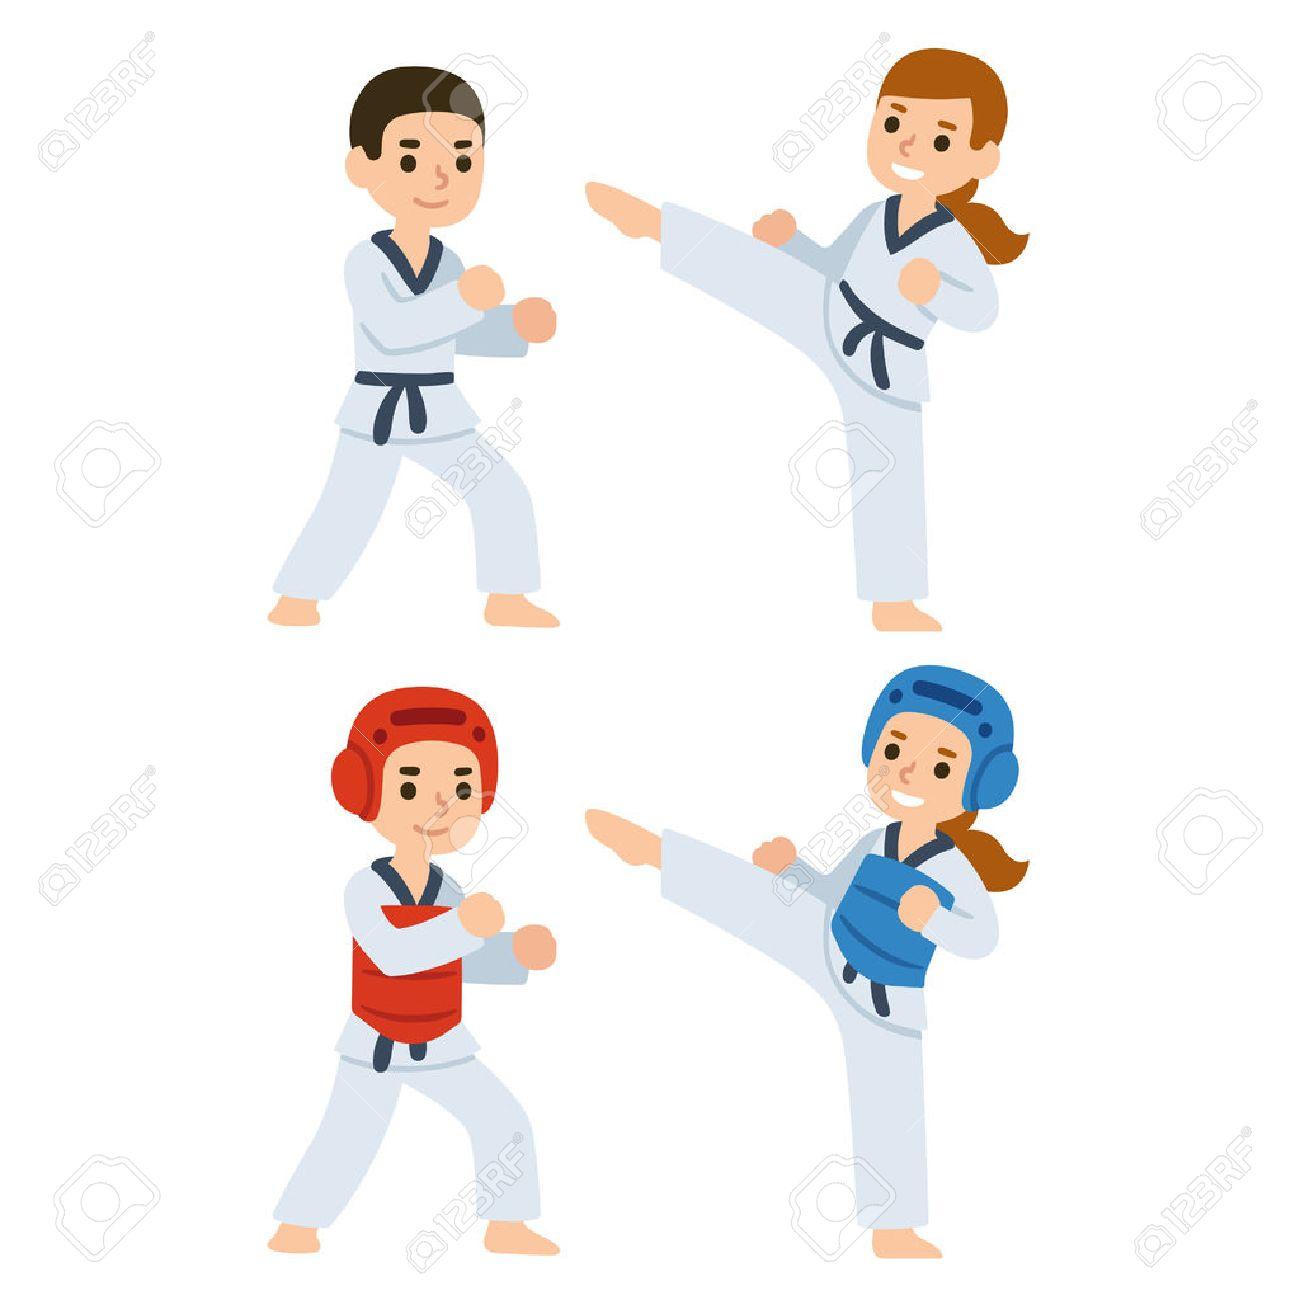 Boy and girl fighting in kimonos and taekwondo uniform. Martial arts for kids illustration. - 62070539